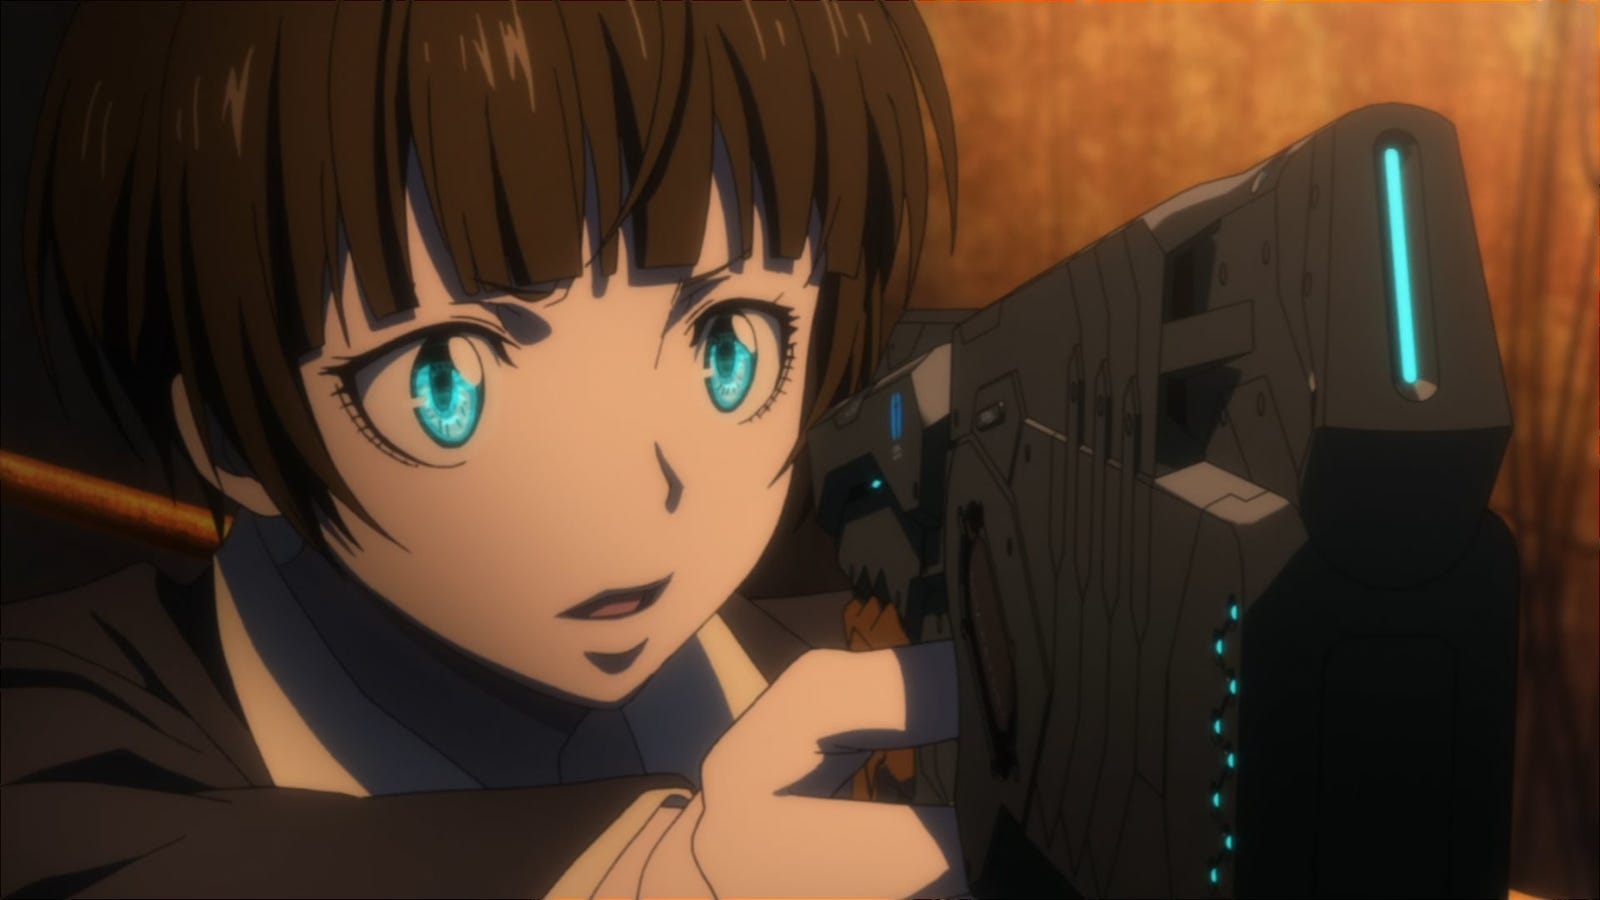 Captura de tela:Production IG(Kotaku)